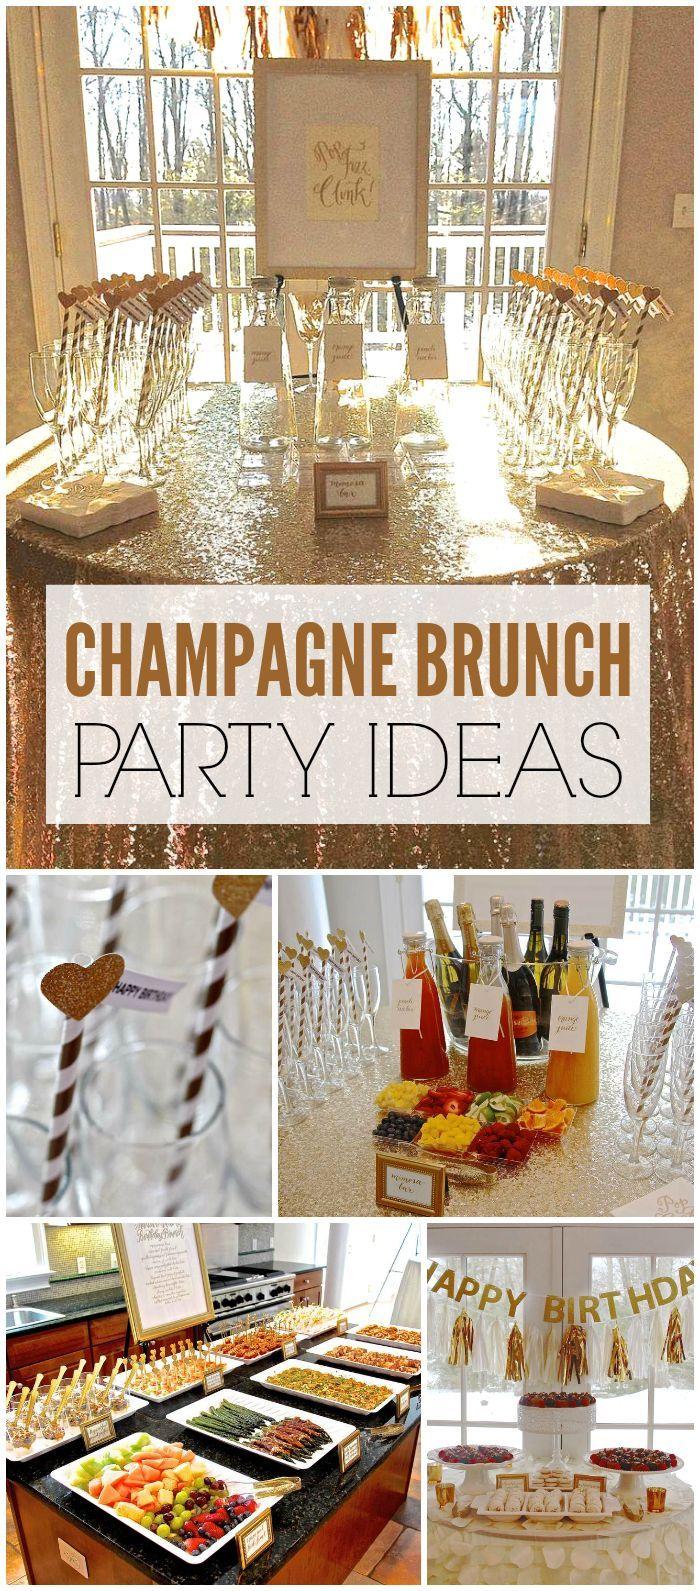 [CasaGiardino]  ♛  Champagne brunch